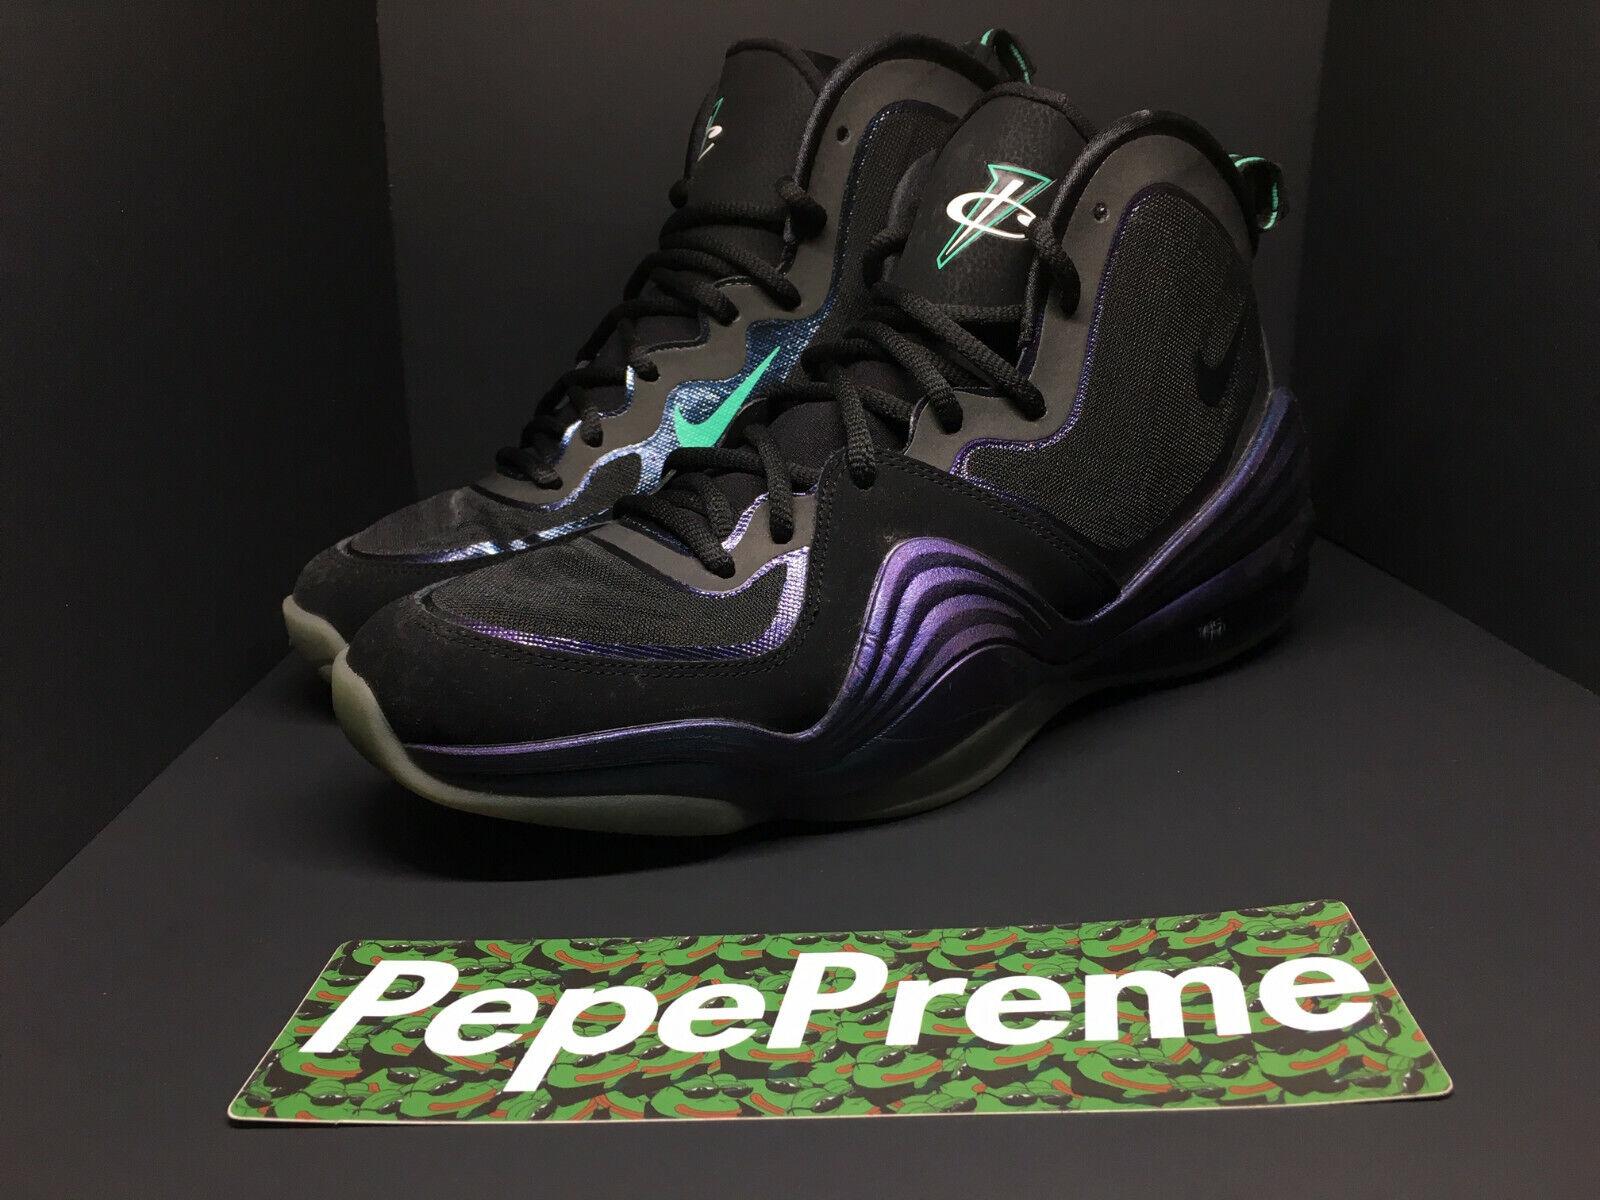 Nike Air Penny 5 V V V Invisibility Cloak 537331-002 Size 10 b14c5b